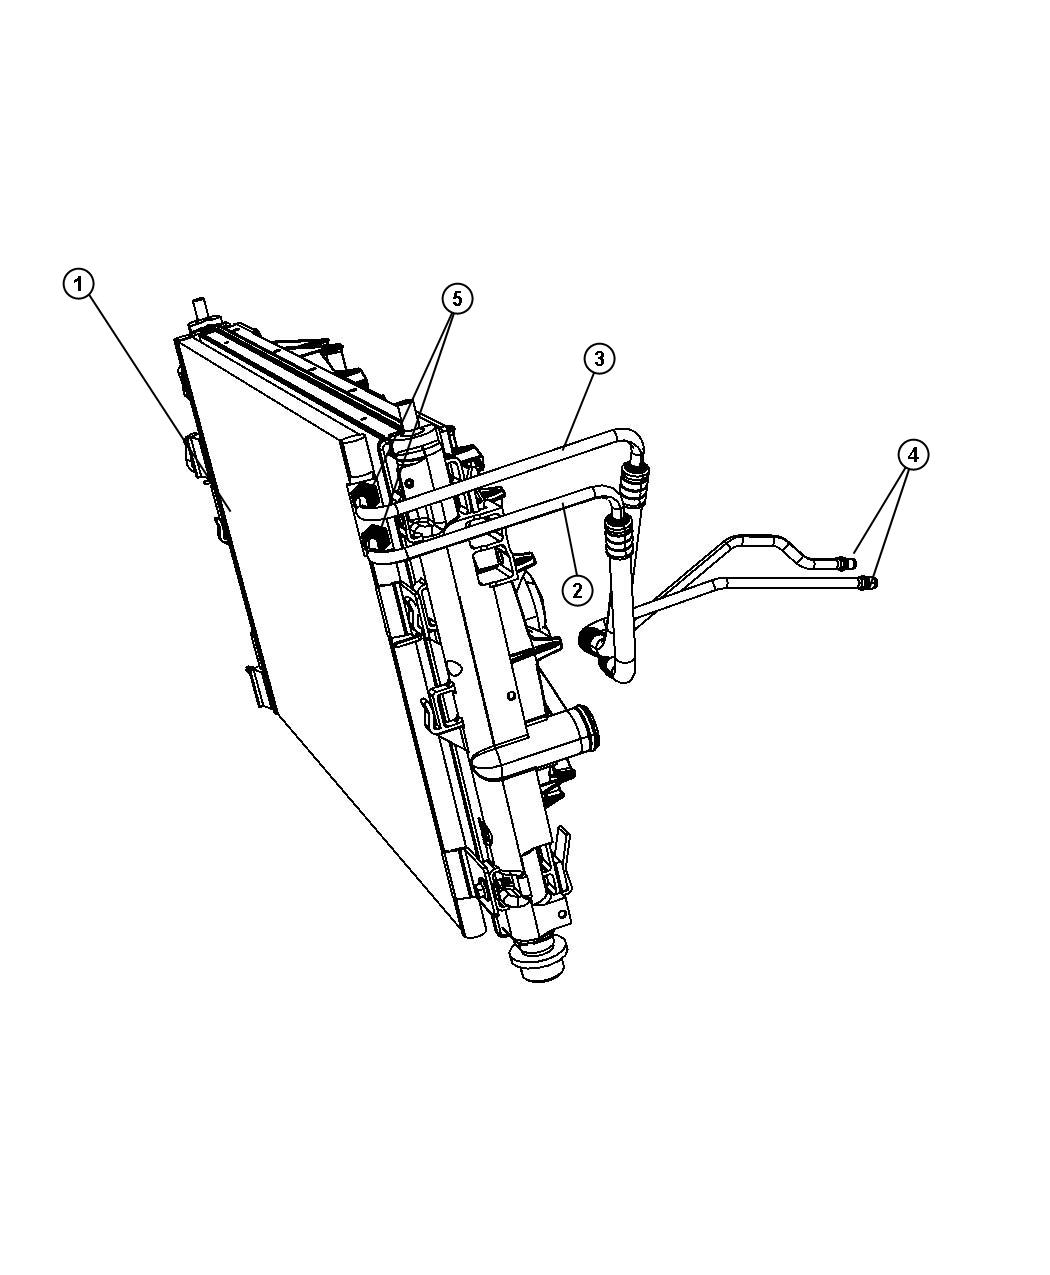 Wiring Diagrams Chrysler Aspen Chrysler Auto Wiring